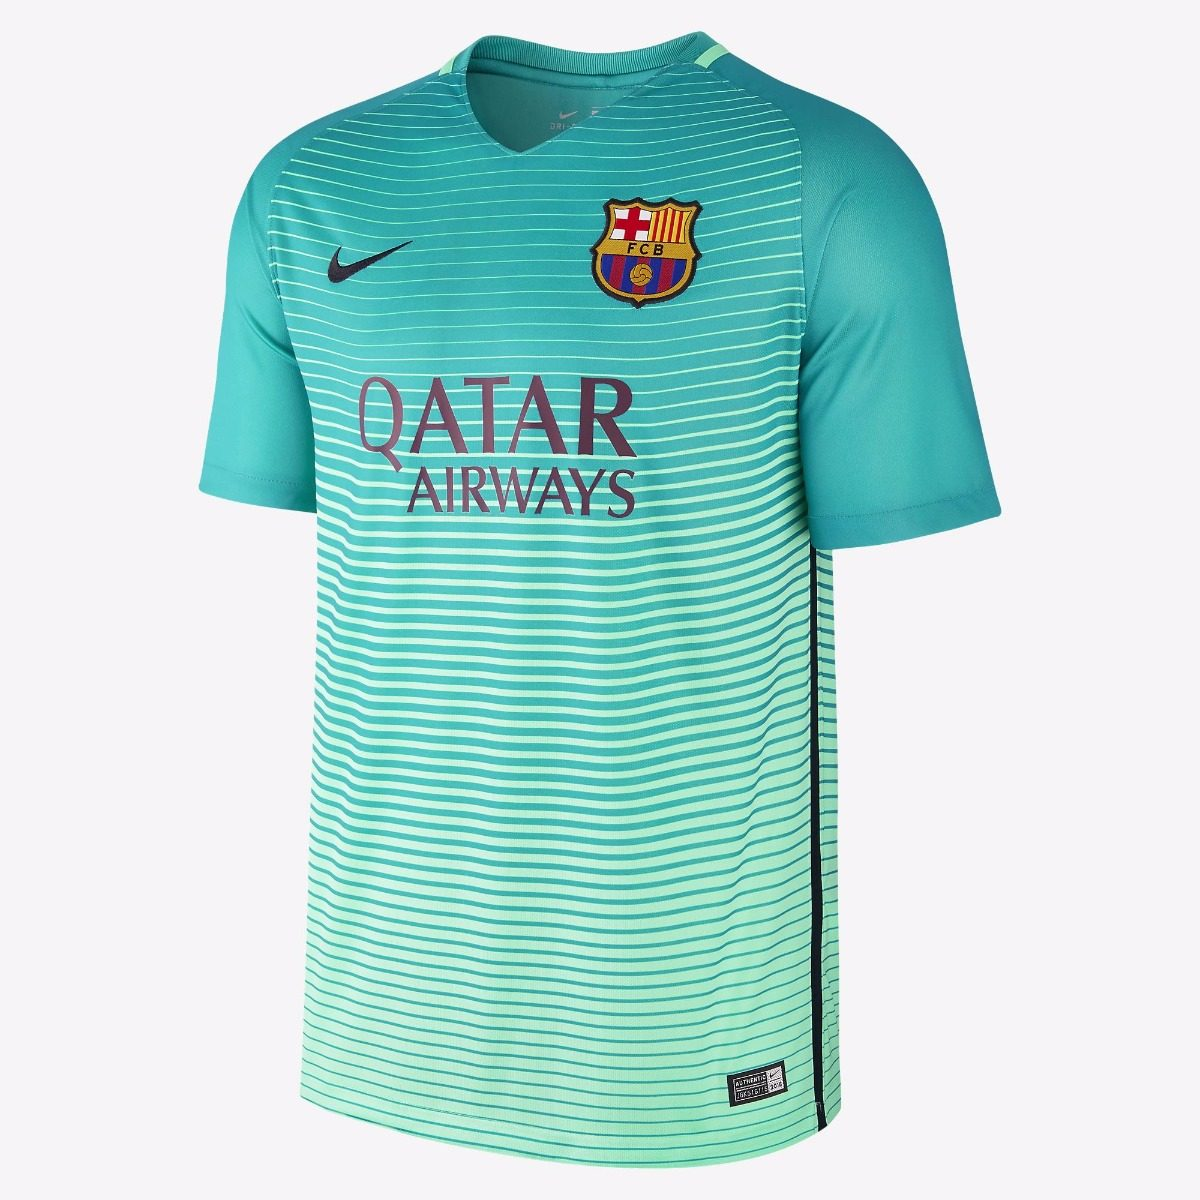 camisa nike barcelona 2016 2017 - infantil gg - original. Carregando zoom. 218b05bf1dffb